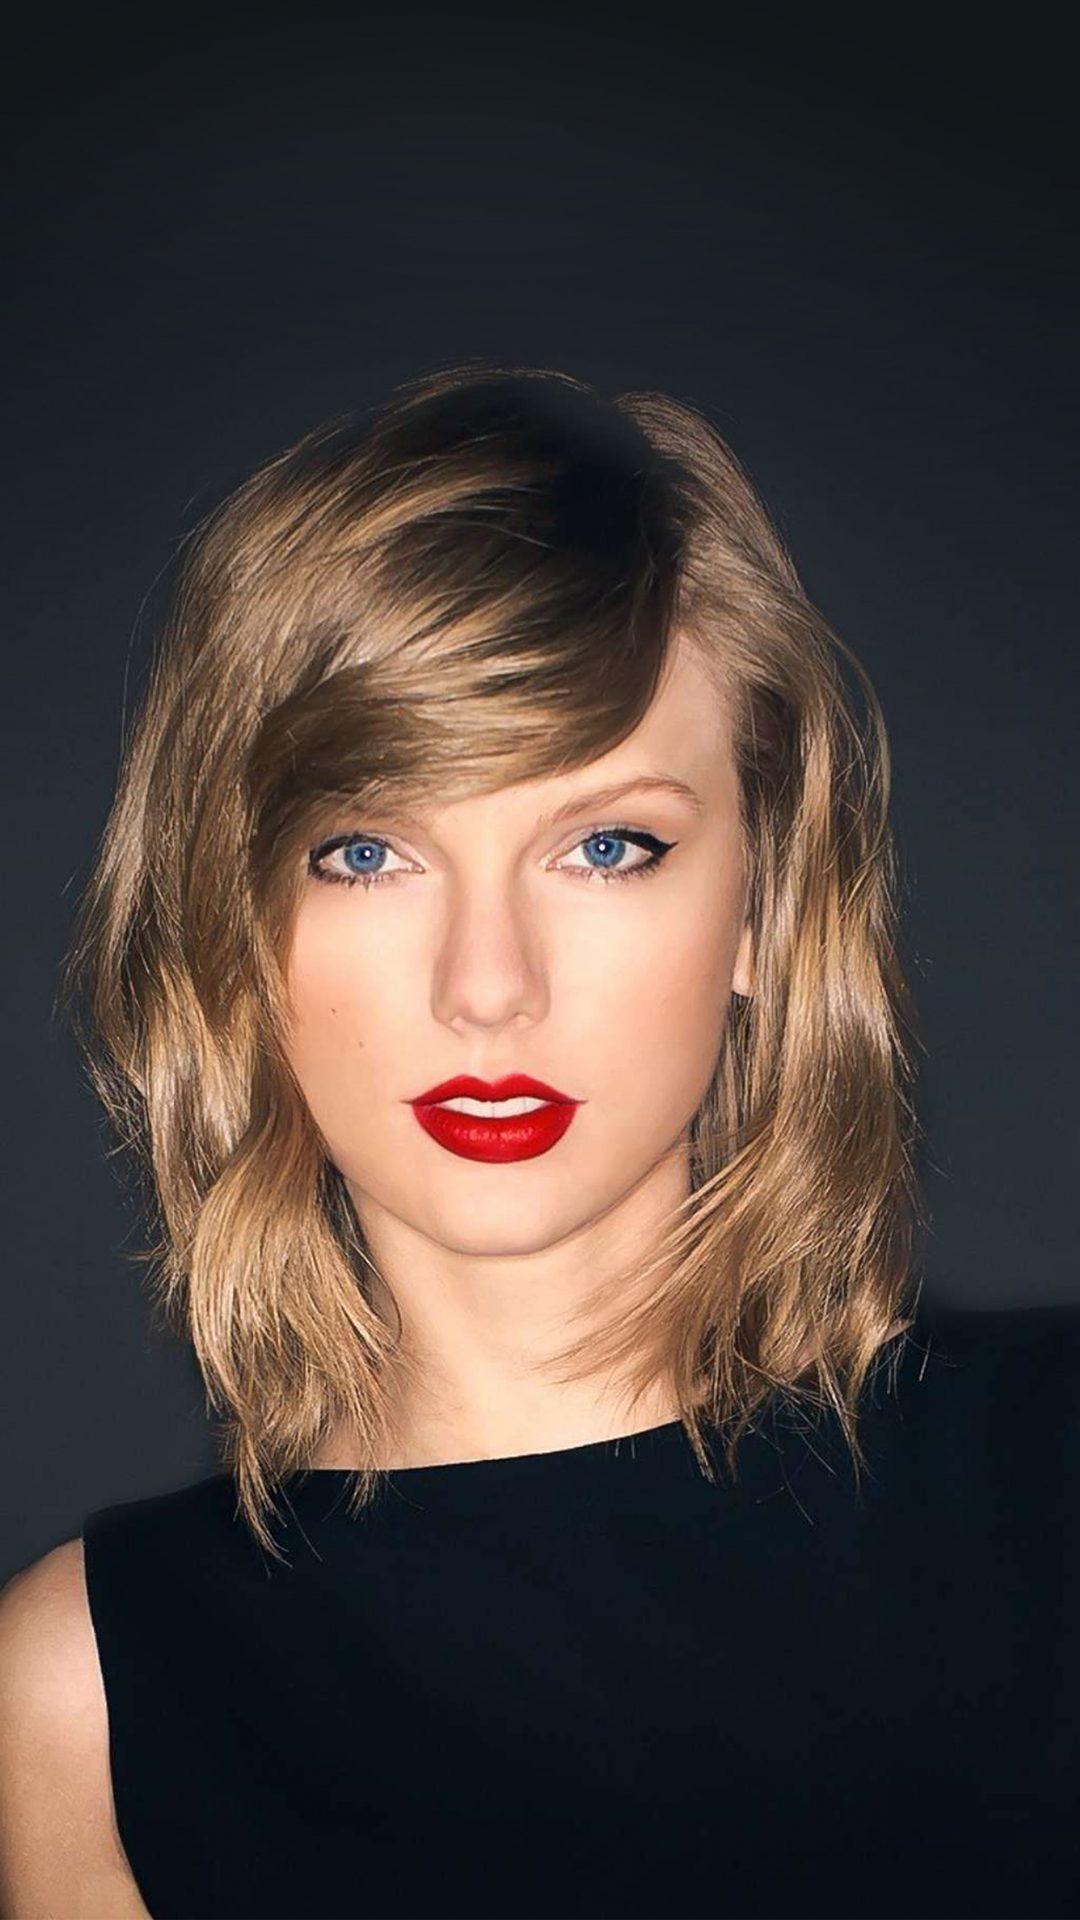 Taylor Swift Dark Lips Music Celebrity